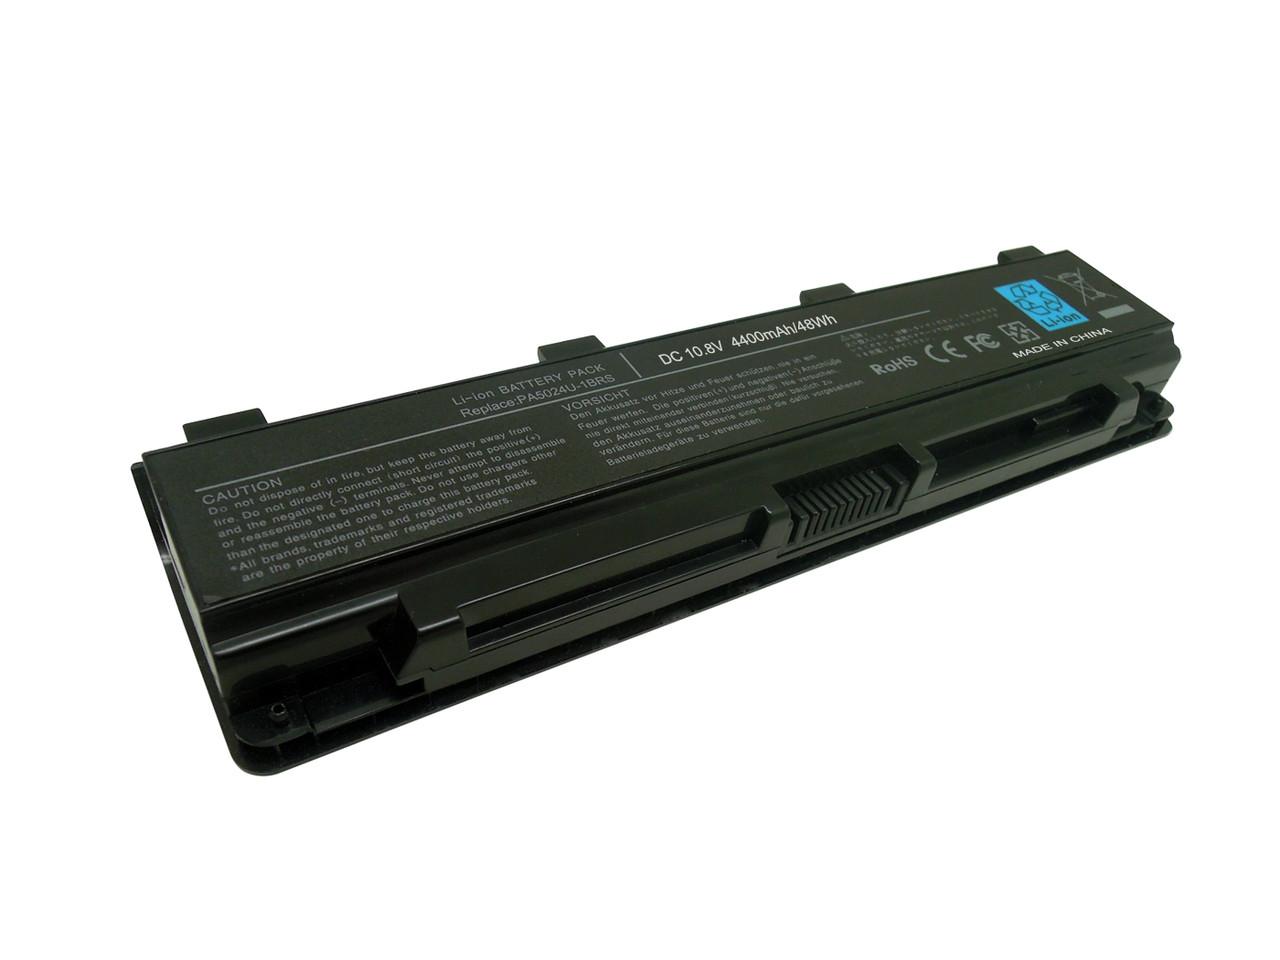 Аккумулятор для ноутбука TOSHIBA SATELLITE P875-S7200